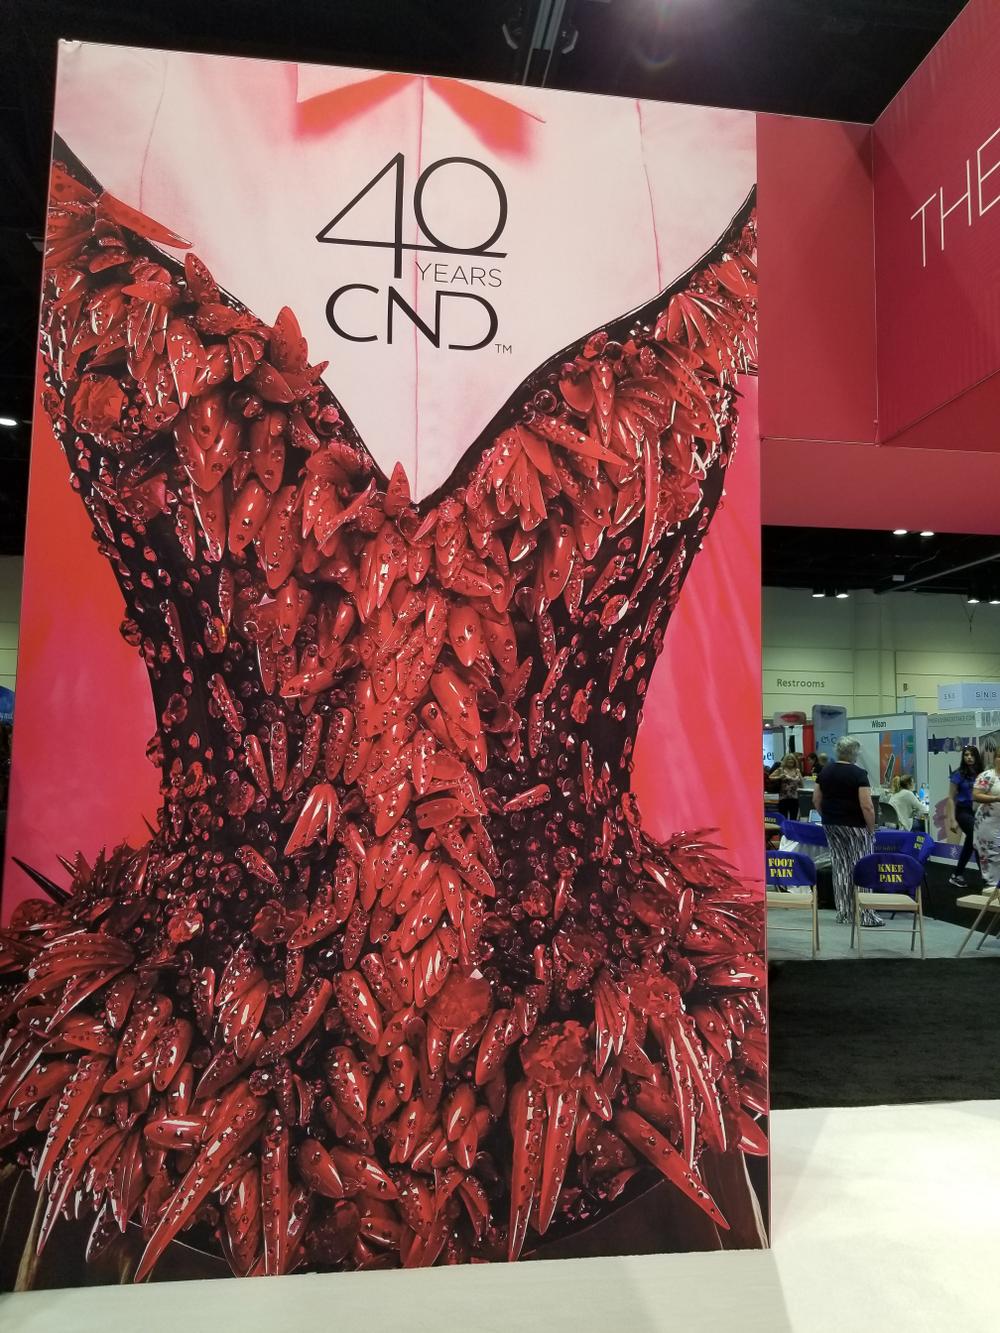 <p>CND celebrates its 40th anniversary.</p>